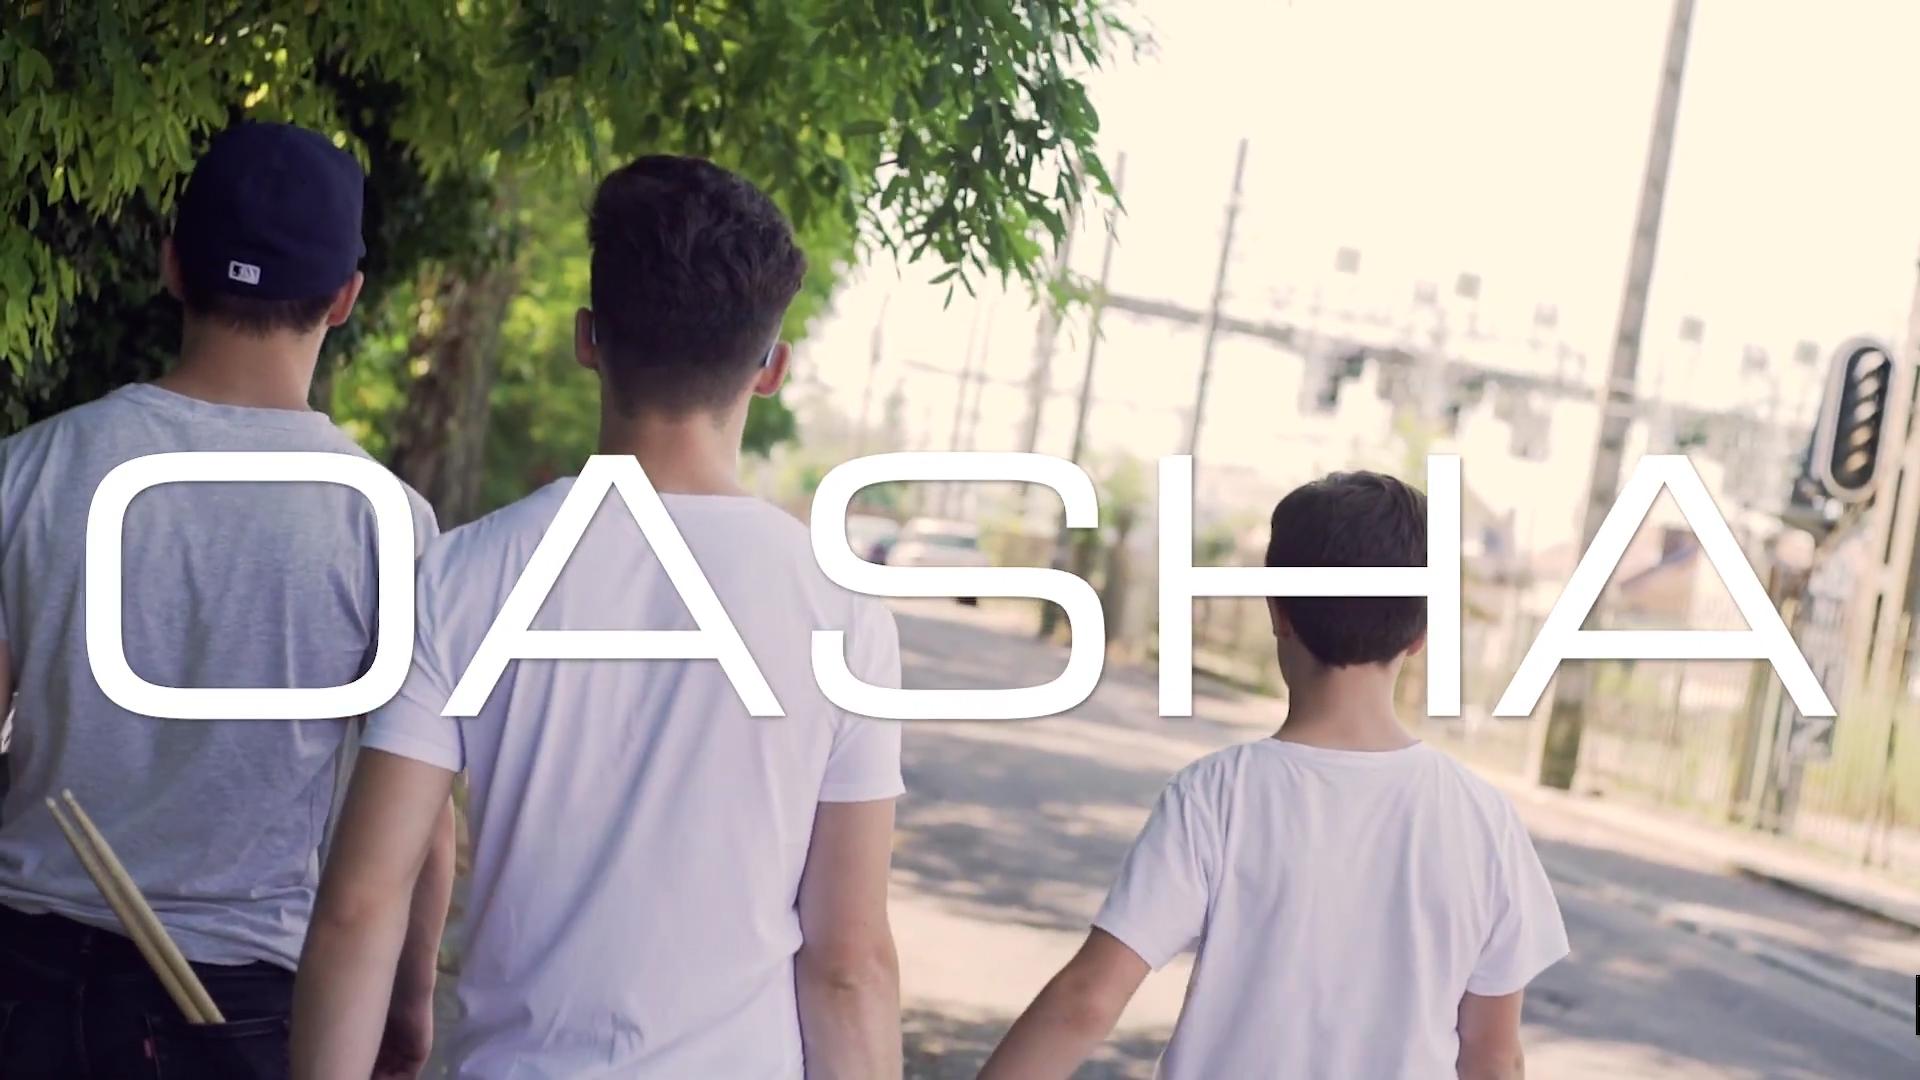 Oasha clip teaser